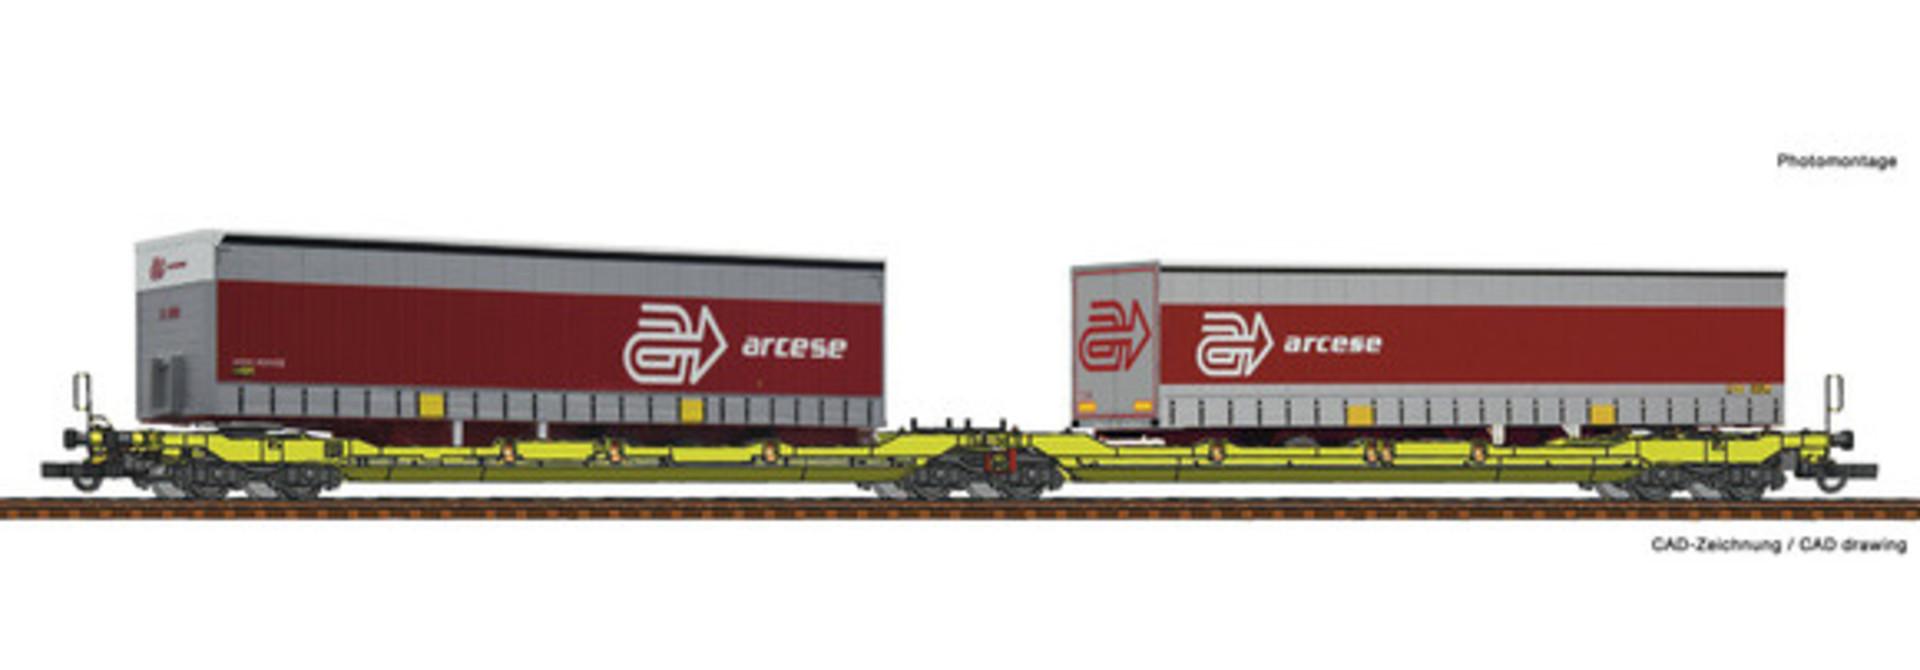 Dubbele containerwagen T3000e + Arcese trailer